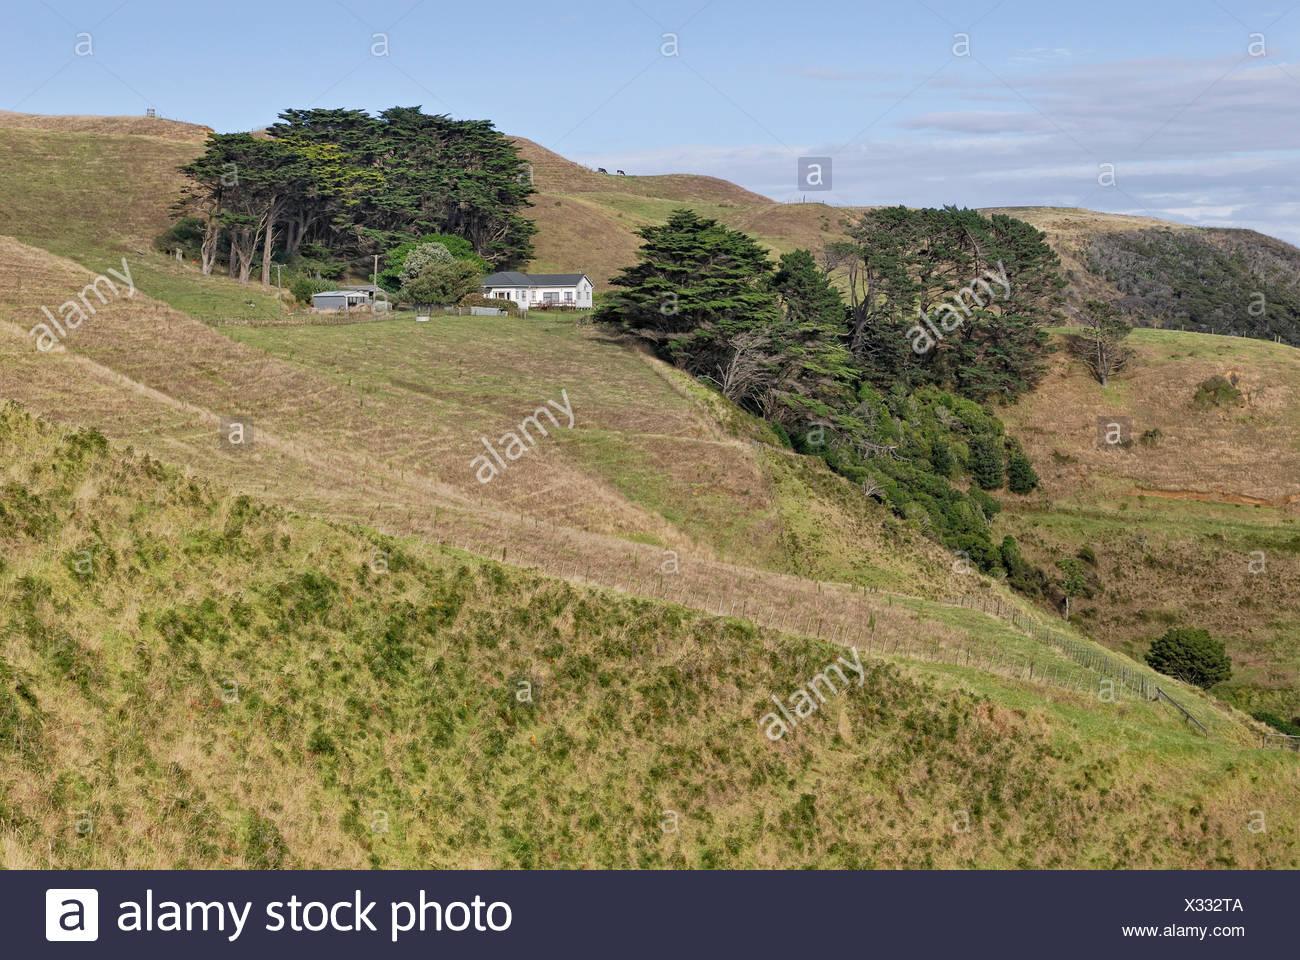 Pastures with farm house on the Lees Gully Road, Manukau Peninsula, North Island, New Zealand - Stock Image